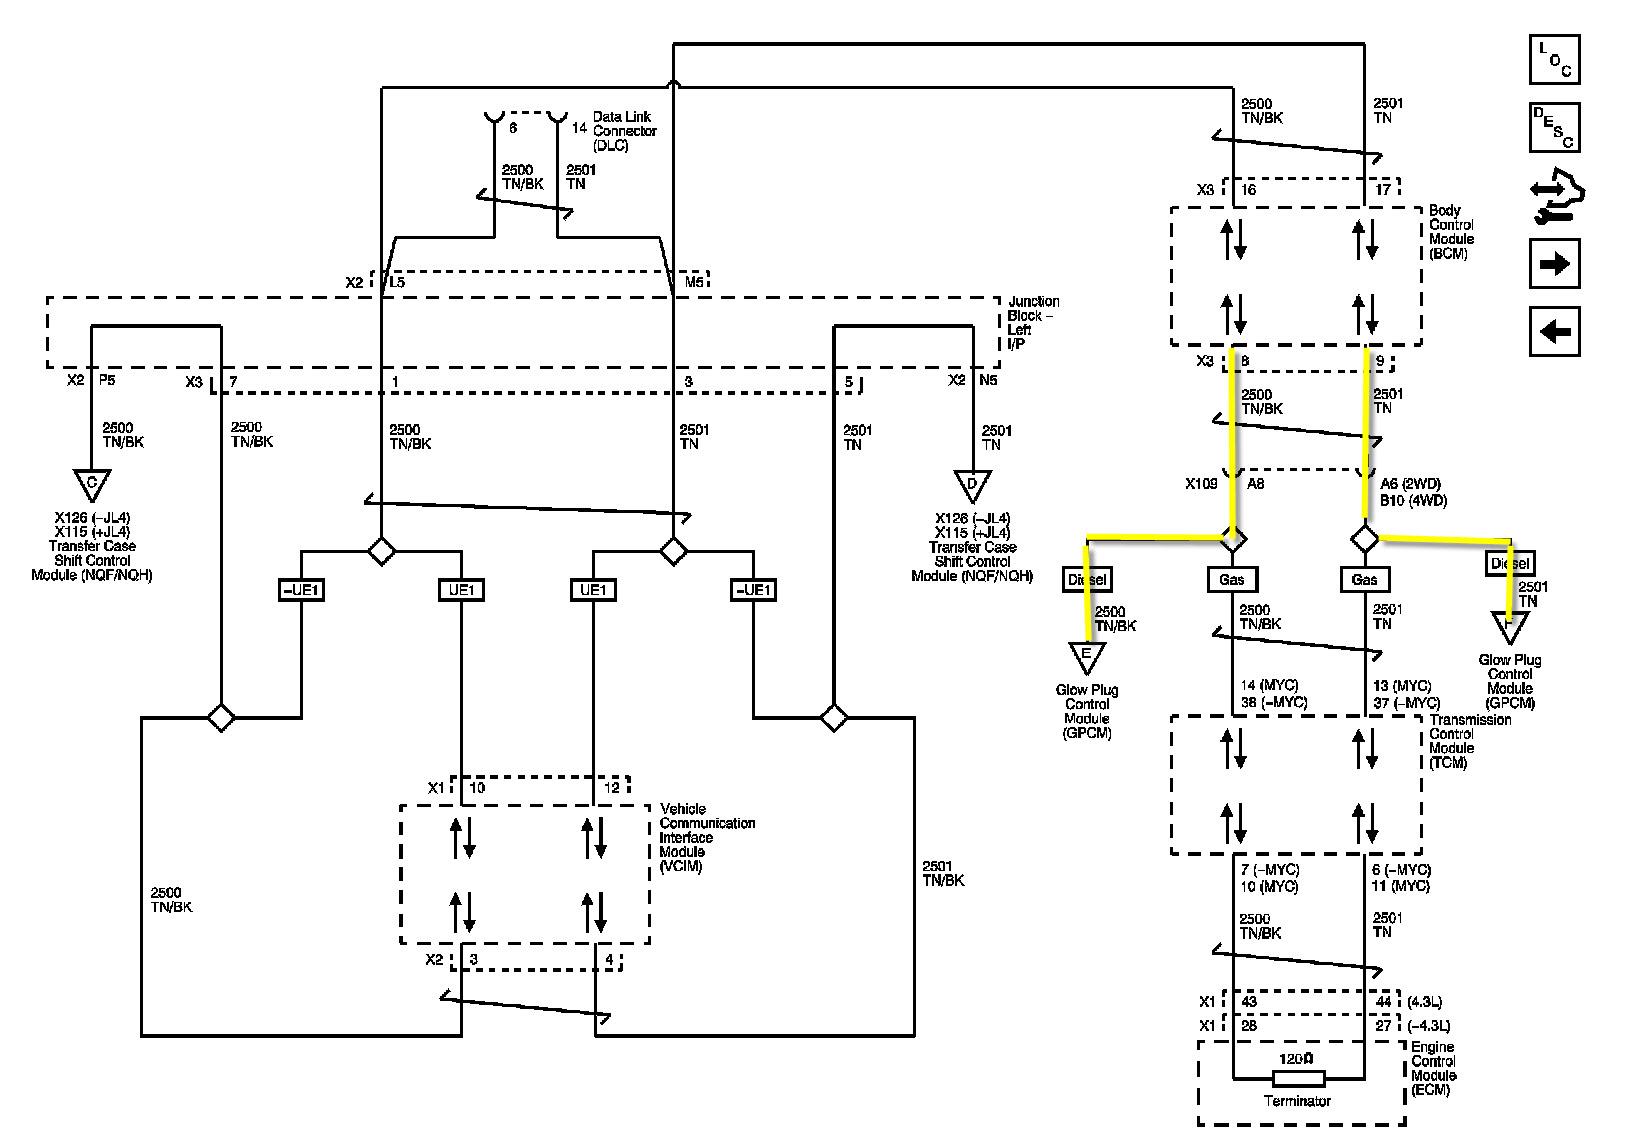 24 Valve Cummins Engine Fuel Line Diagram Free Wiring For 5 9 Lbz Minn Kota Volt Trolling Motor Isx 59 Injector Pump